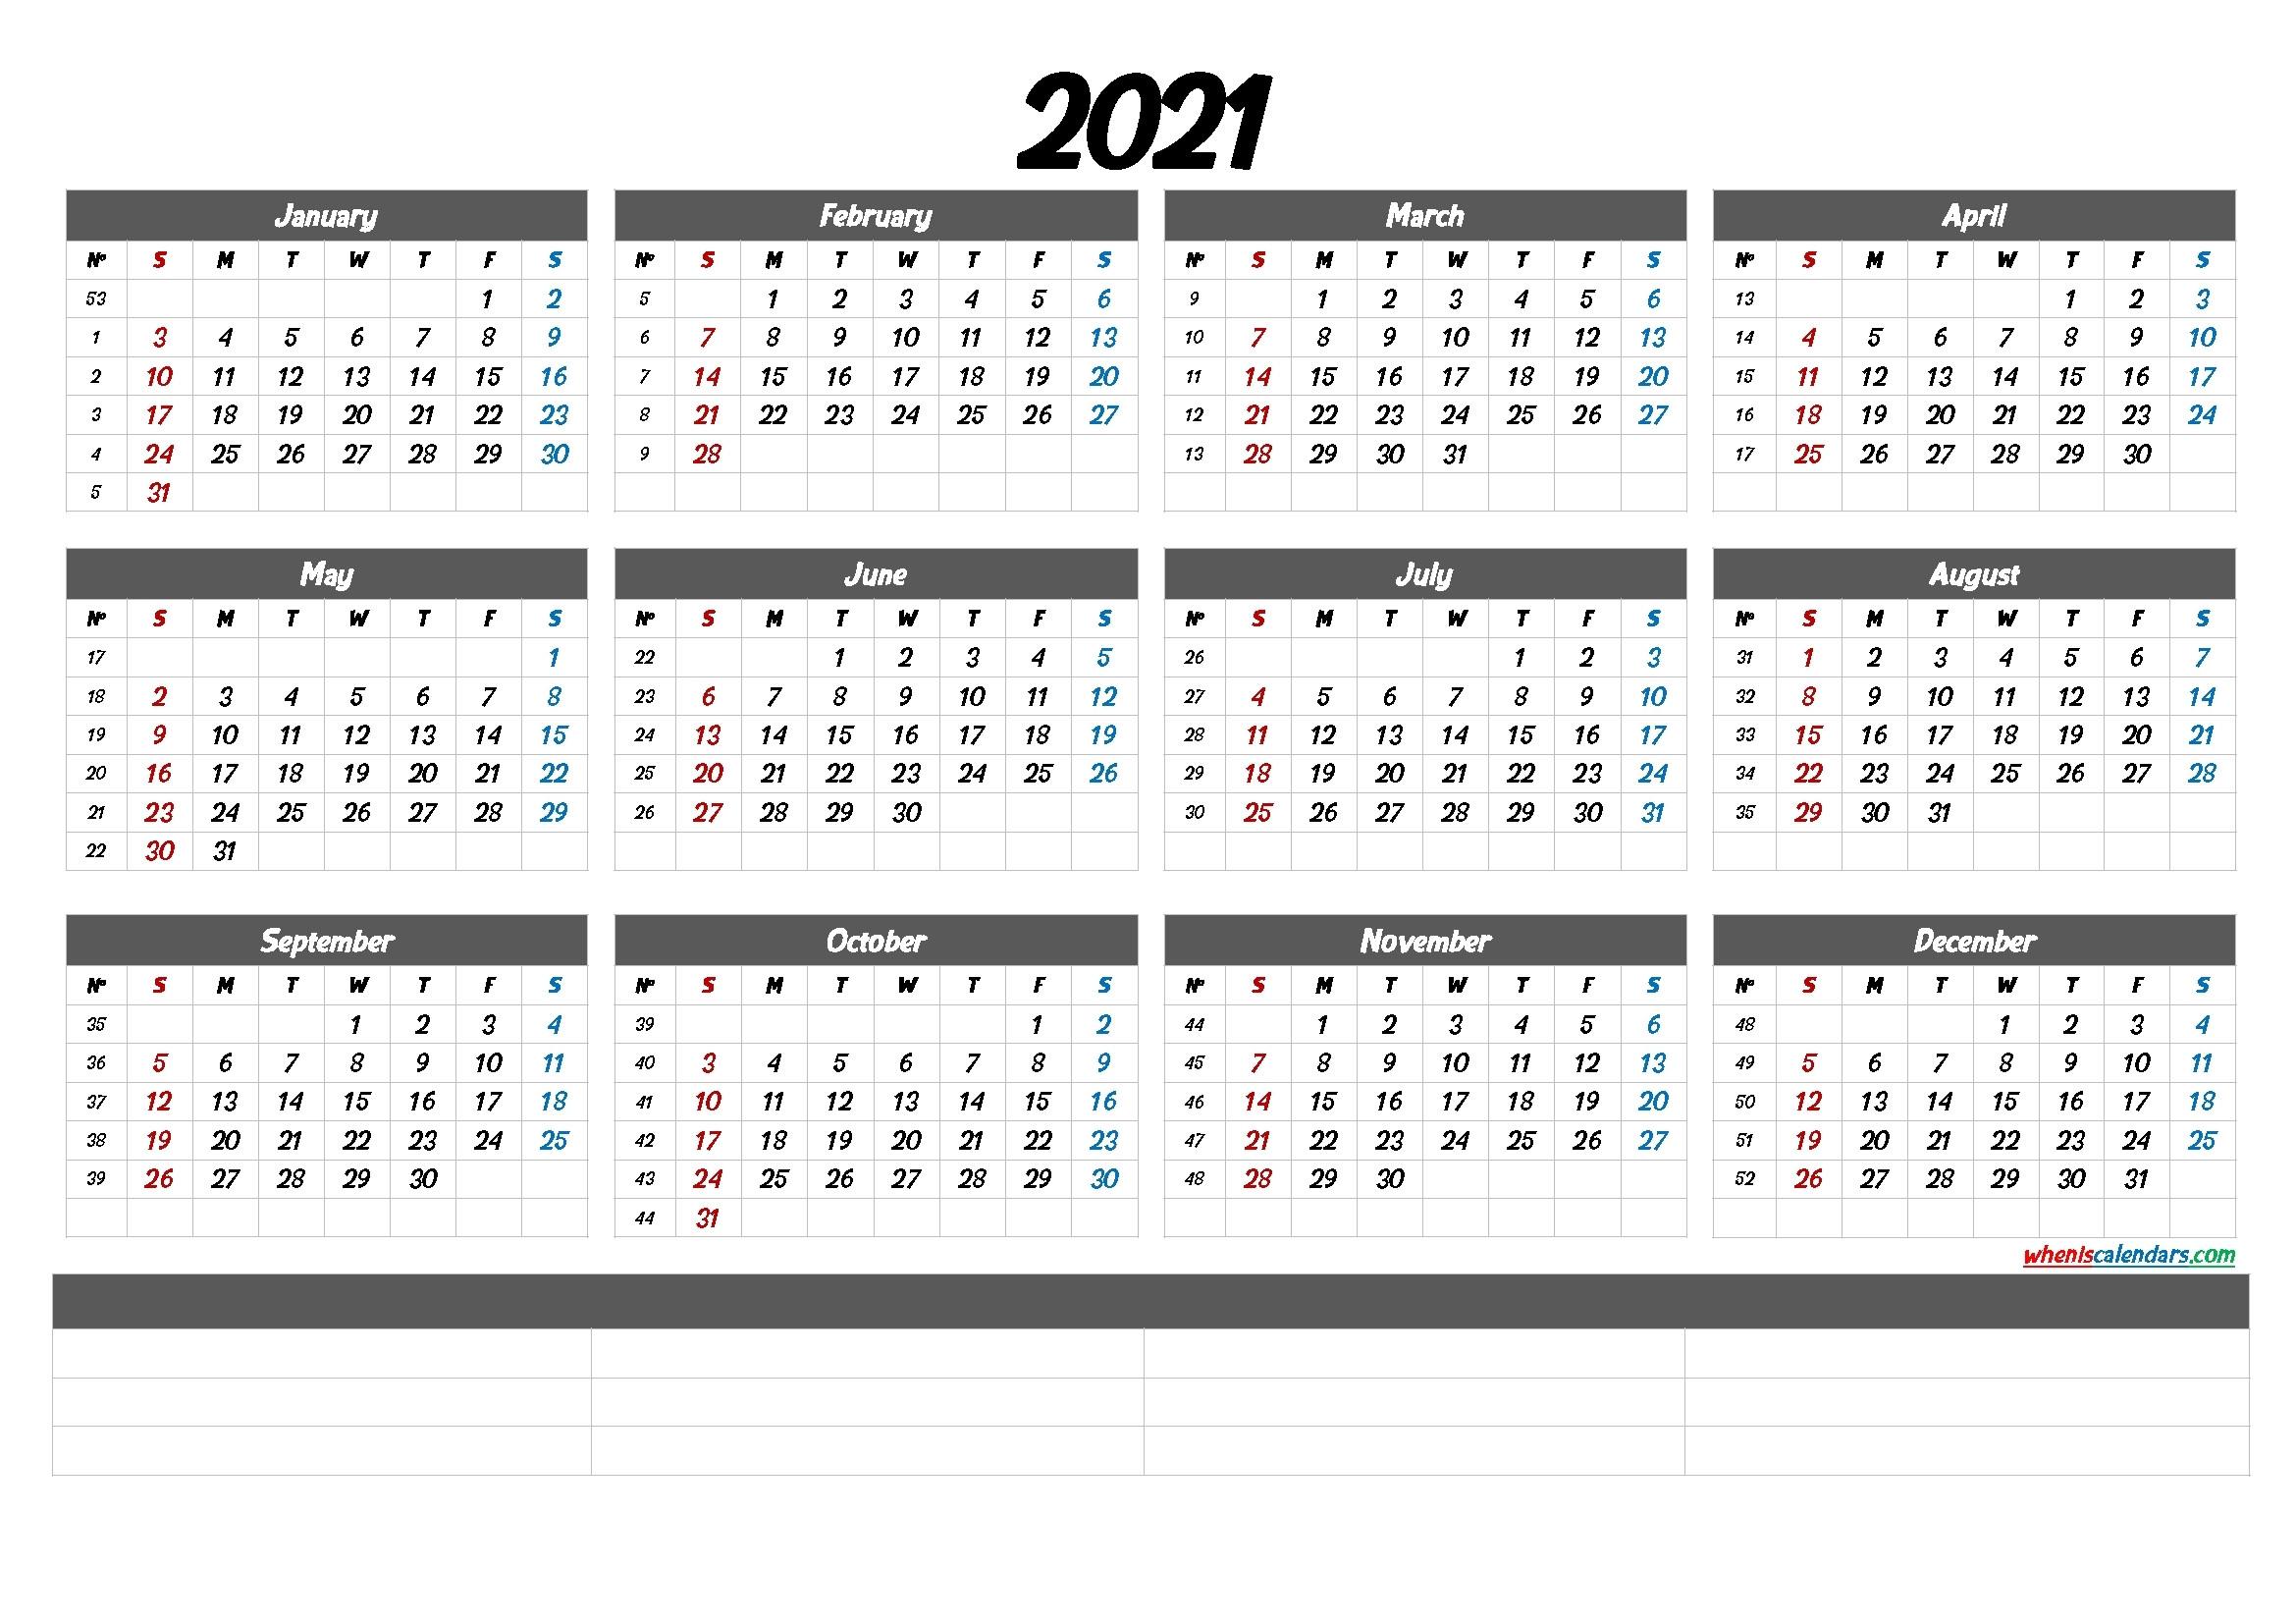 2021 Yearly Calendar With Week Number Printable | Ten Free-Excel Calendar 2021 With Week Numbers